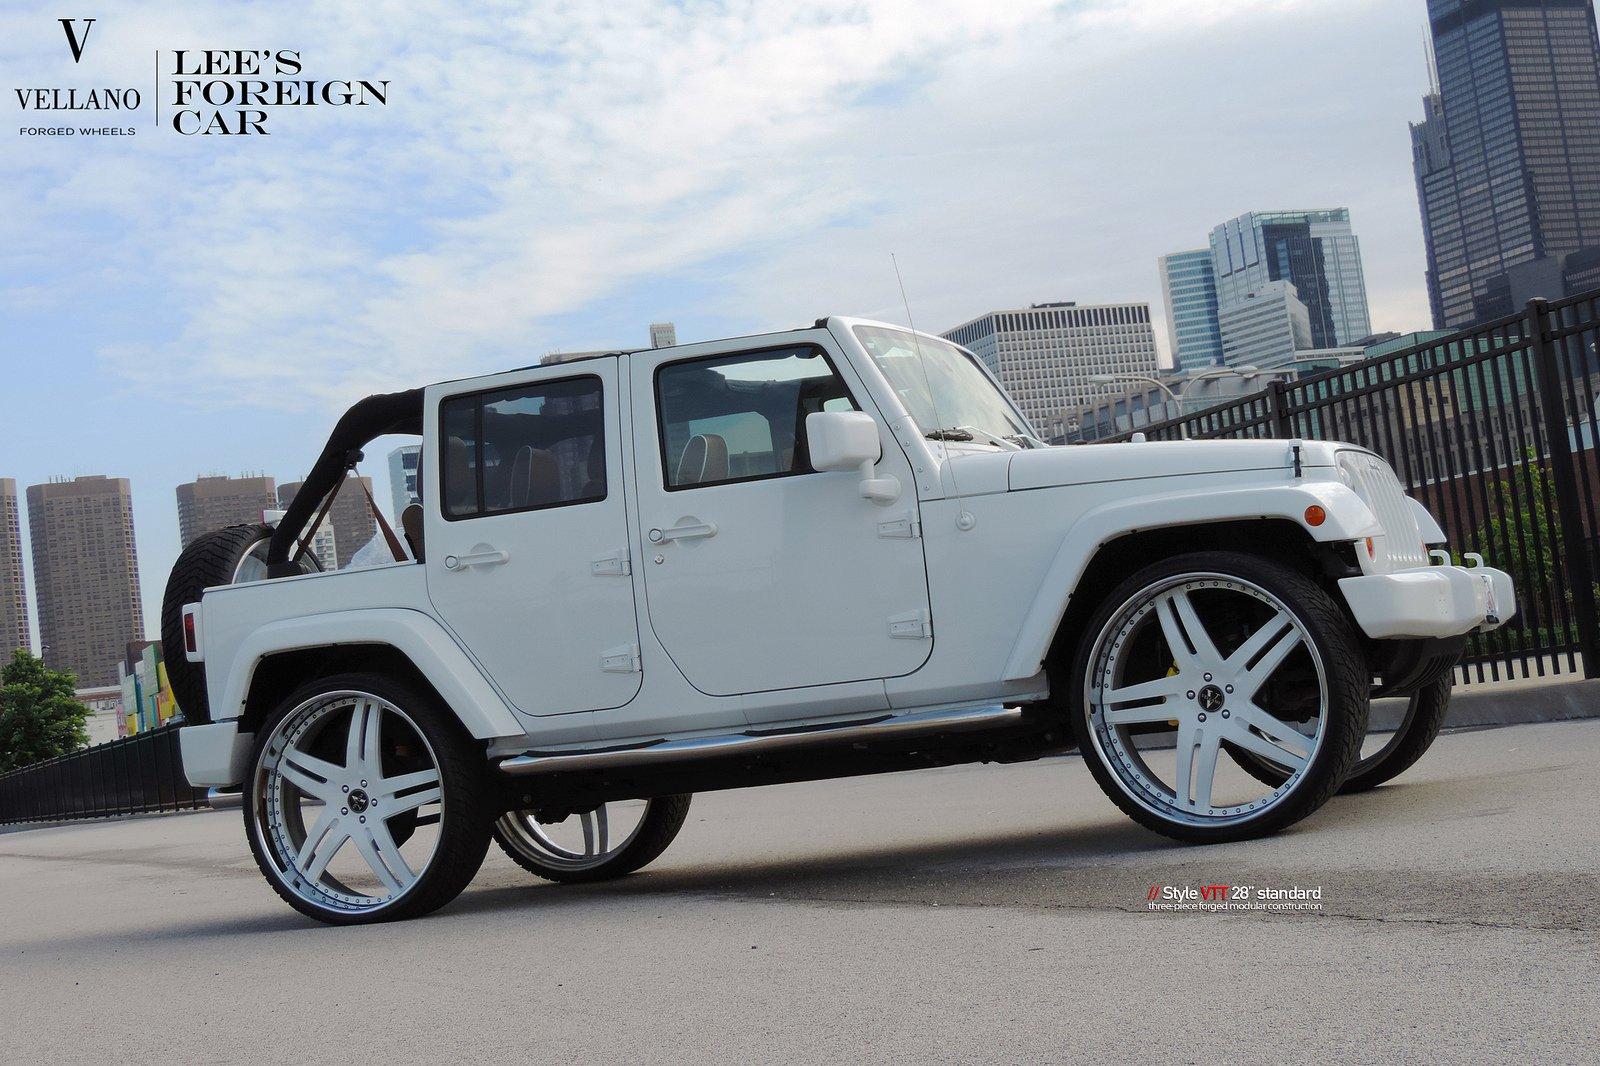 Jeep Wrangler 2018 Tuning >> Jeep wrangler white Vellano wheels tuning cars wallpaper | 1600x1066 | 392301 | WallpaperUP